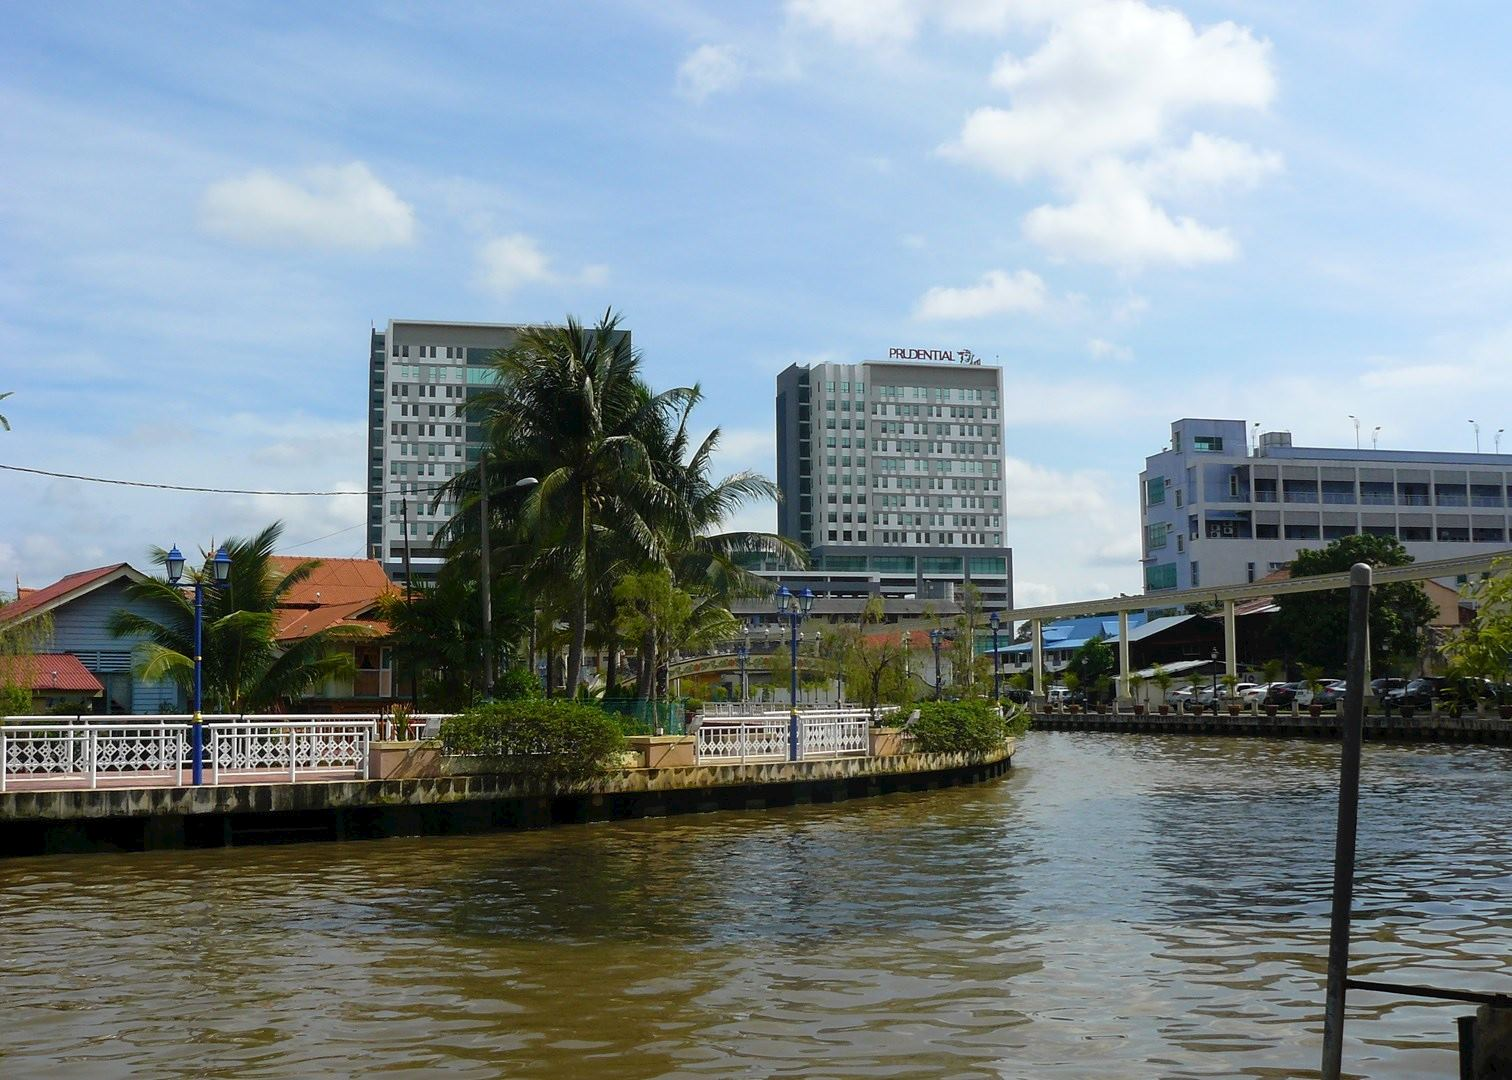 10 Best Cheap Hotels Near Malacca River - Hotels.com